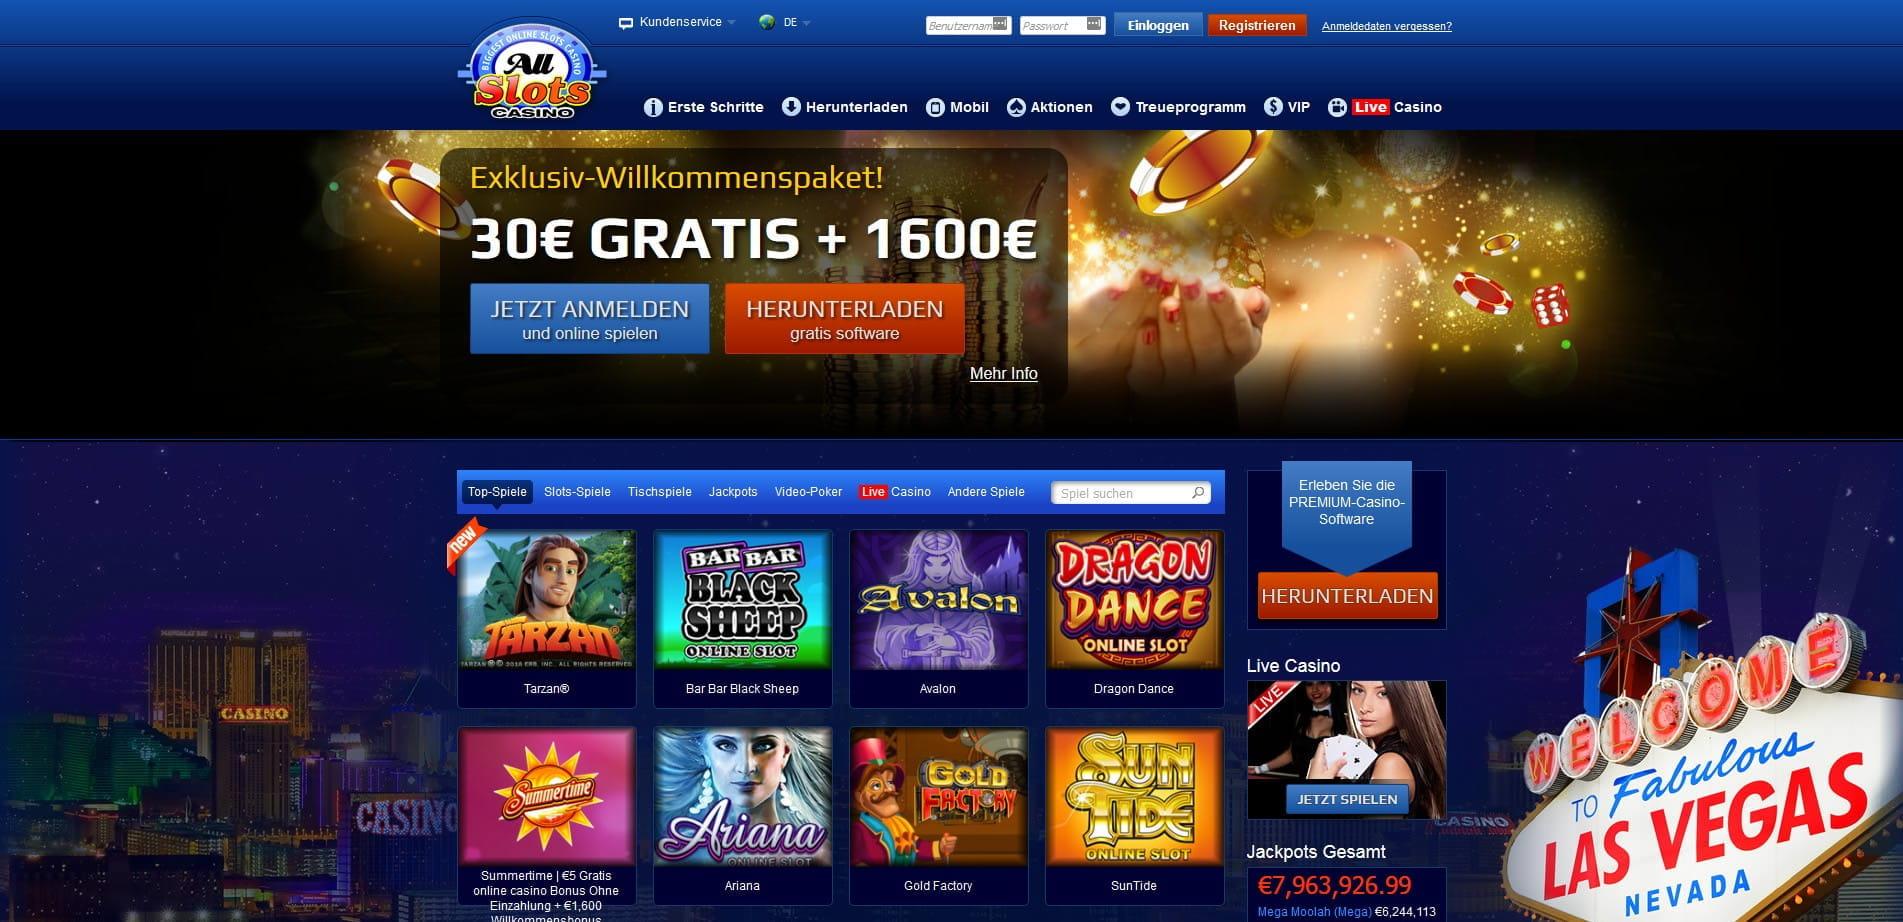 www.all slots casino.com